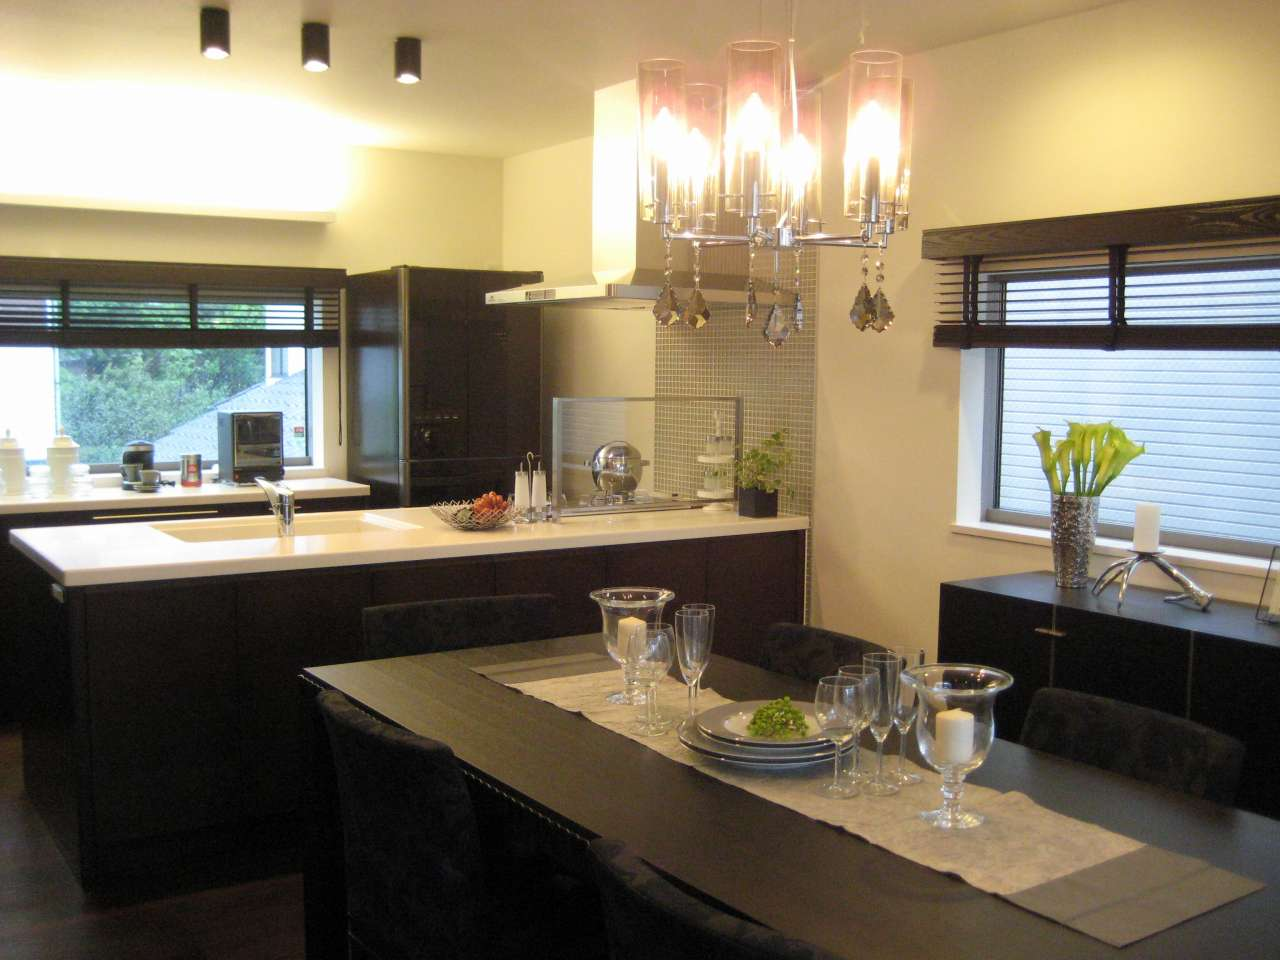 dream hebel haus. Black Bedroom Furniture Sets. Home Design Ideas